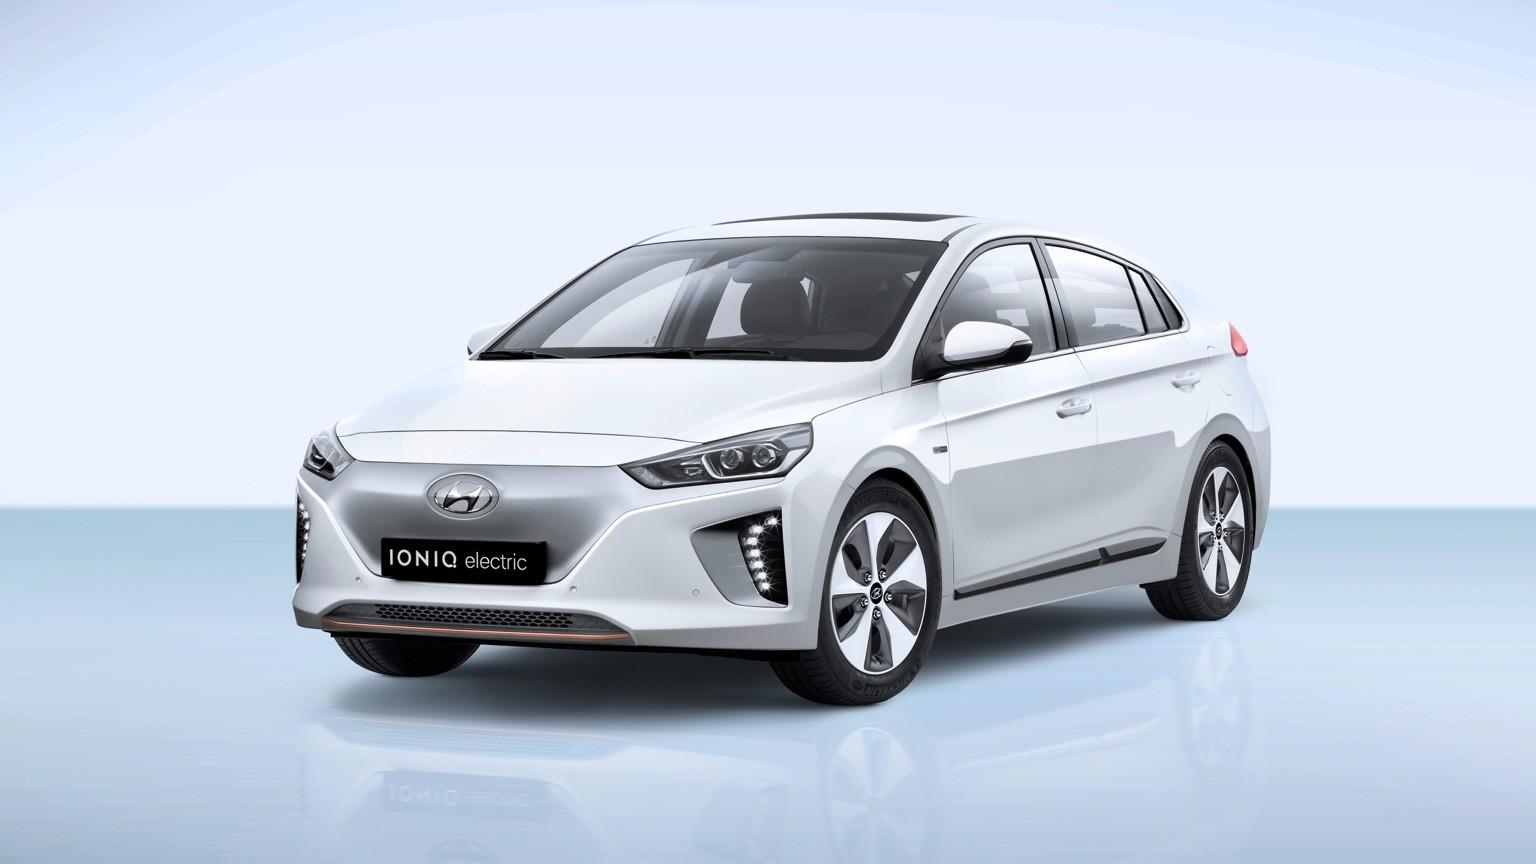 Hyundai IONIQ Gen 2 Electric